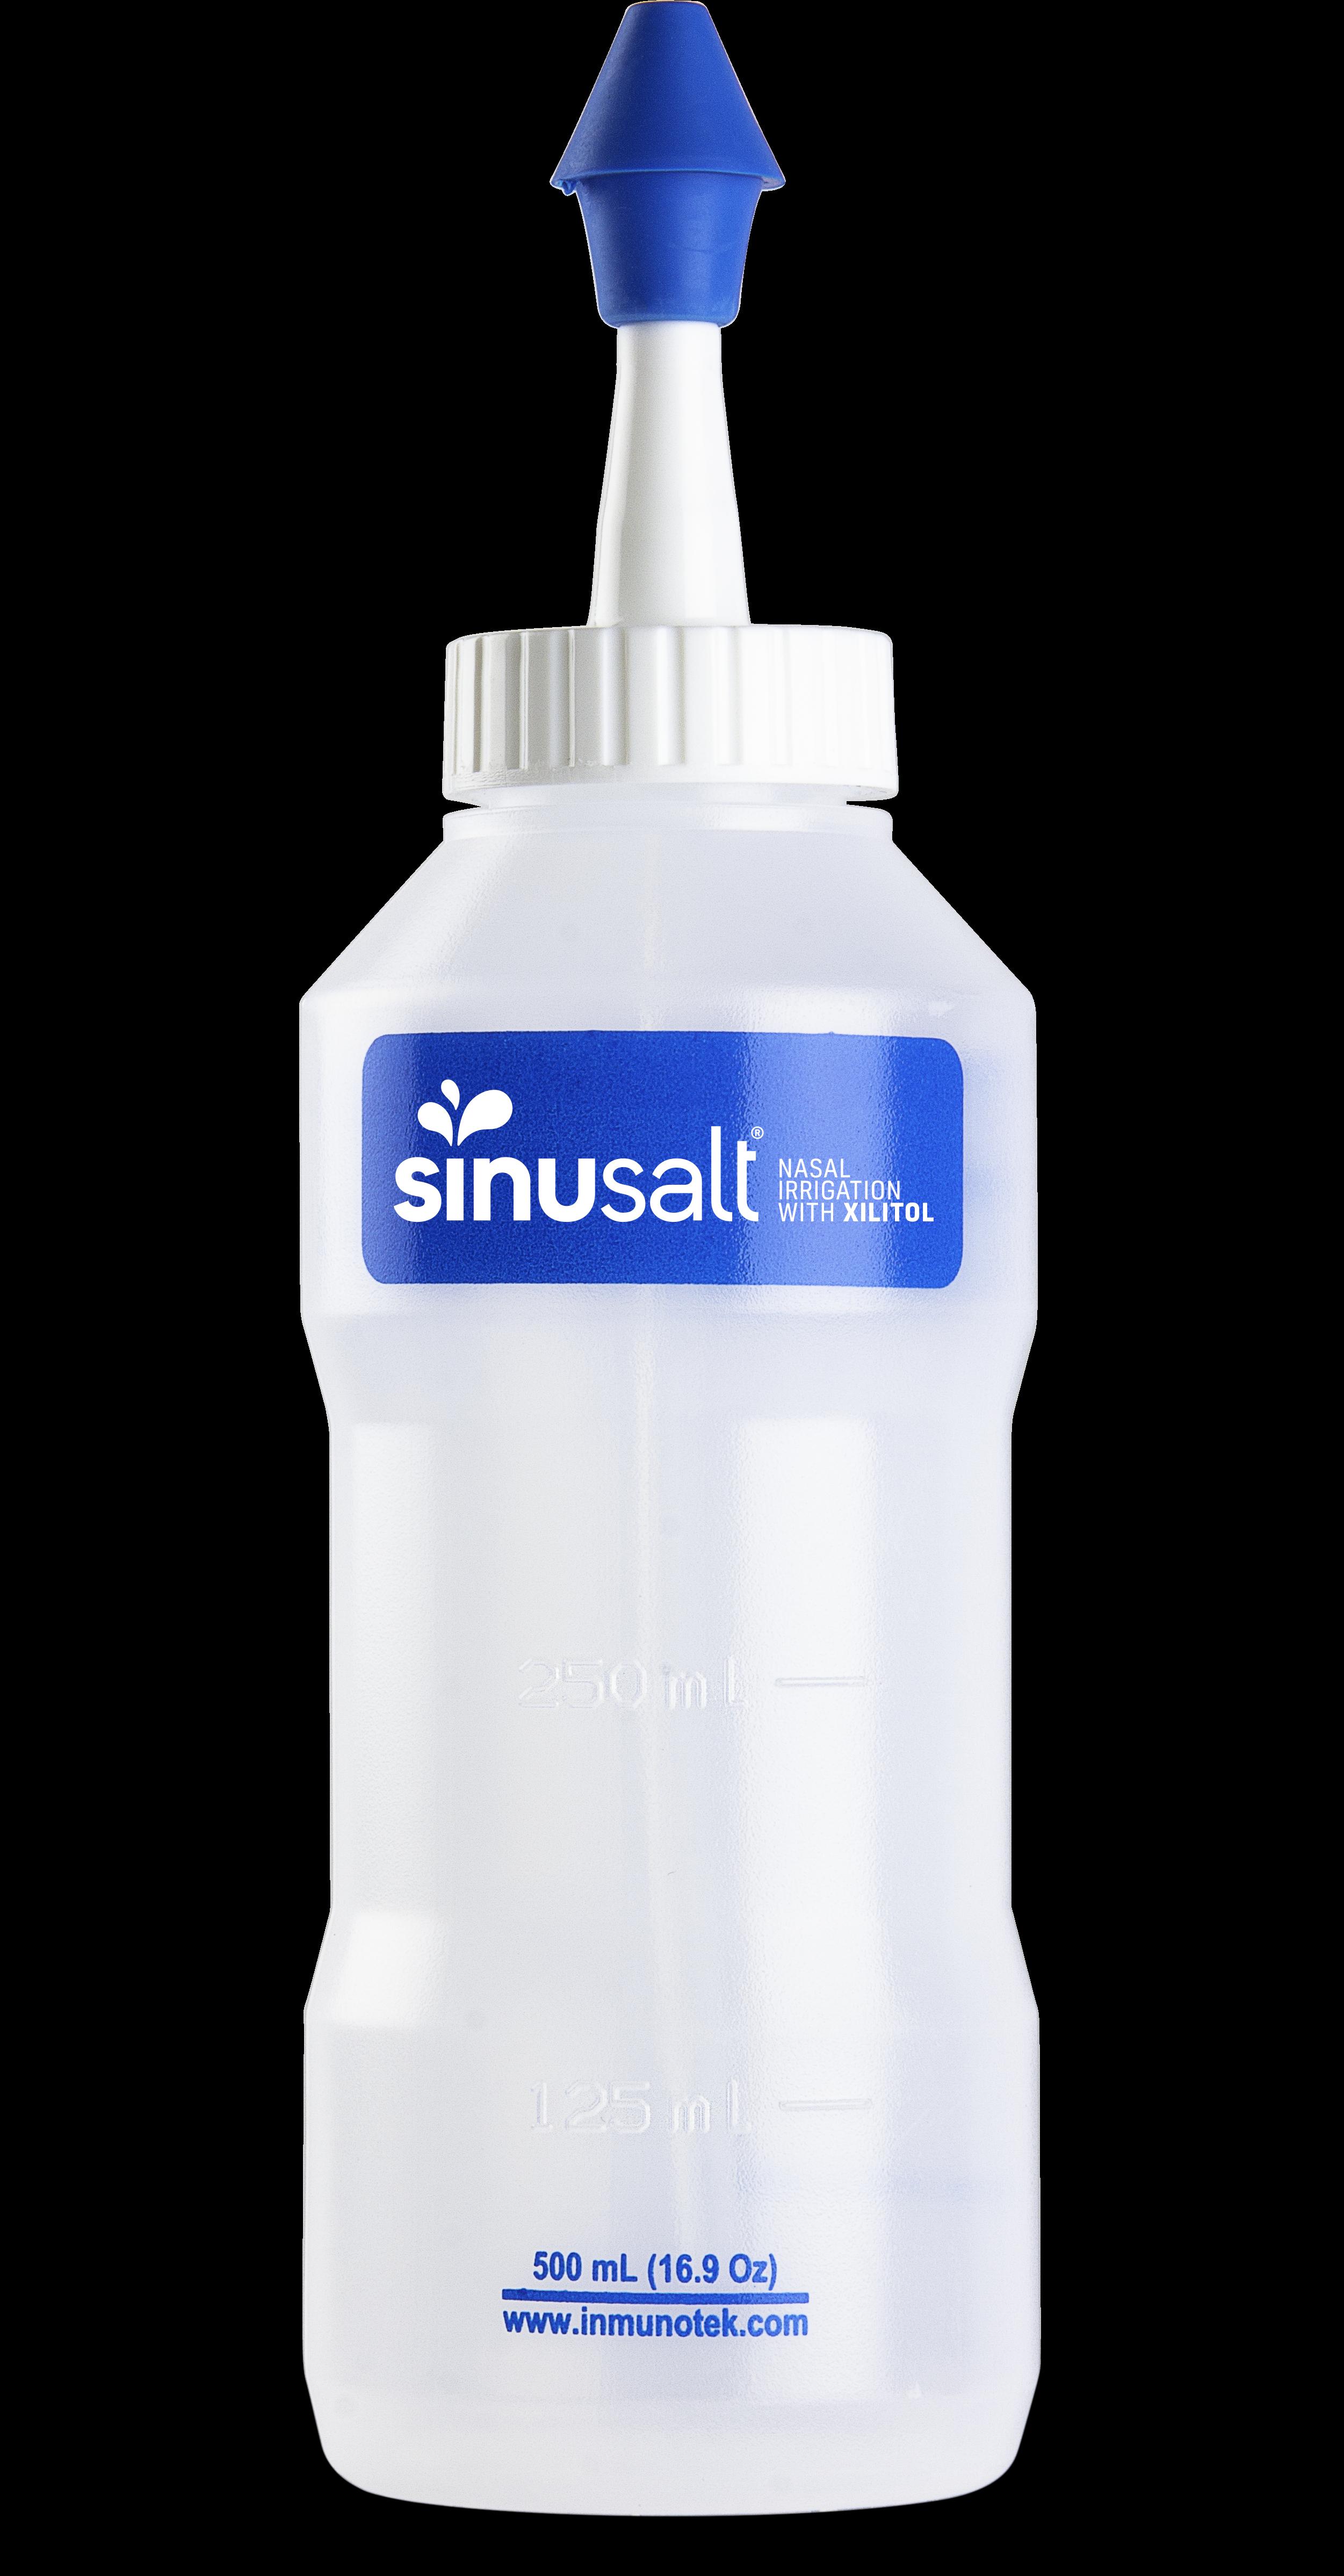 Sinusalt Bottle